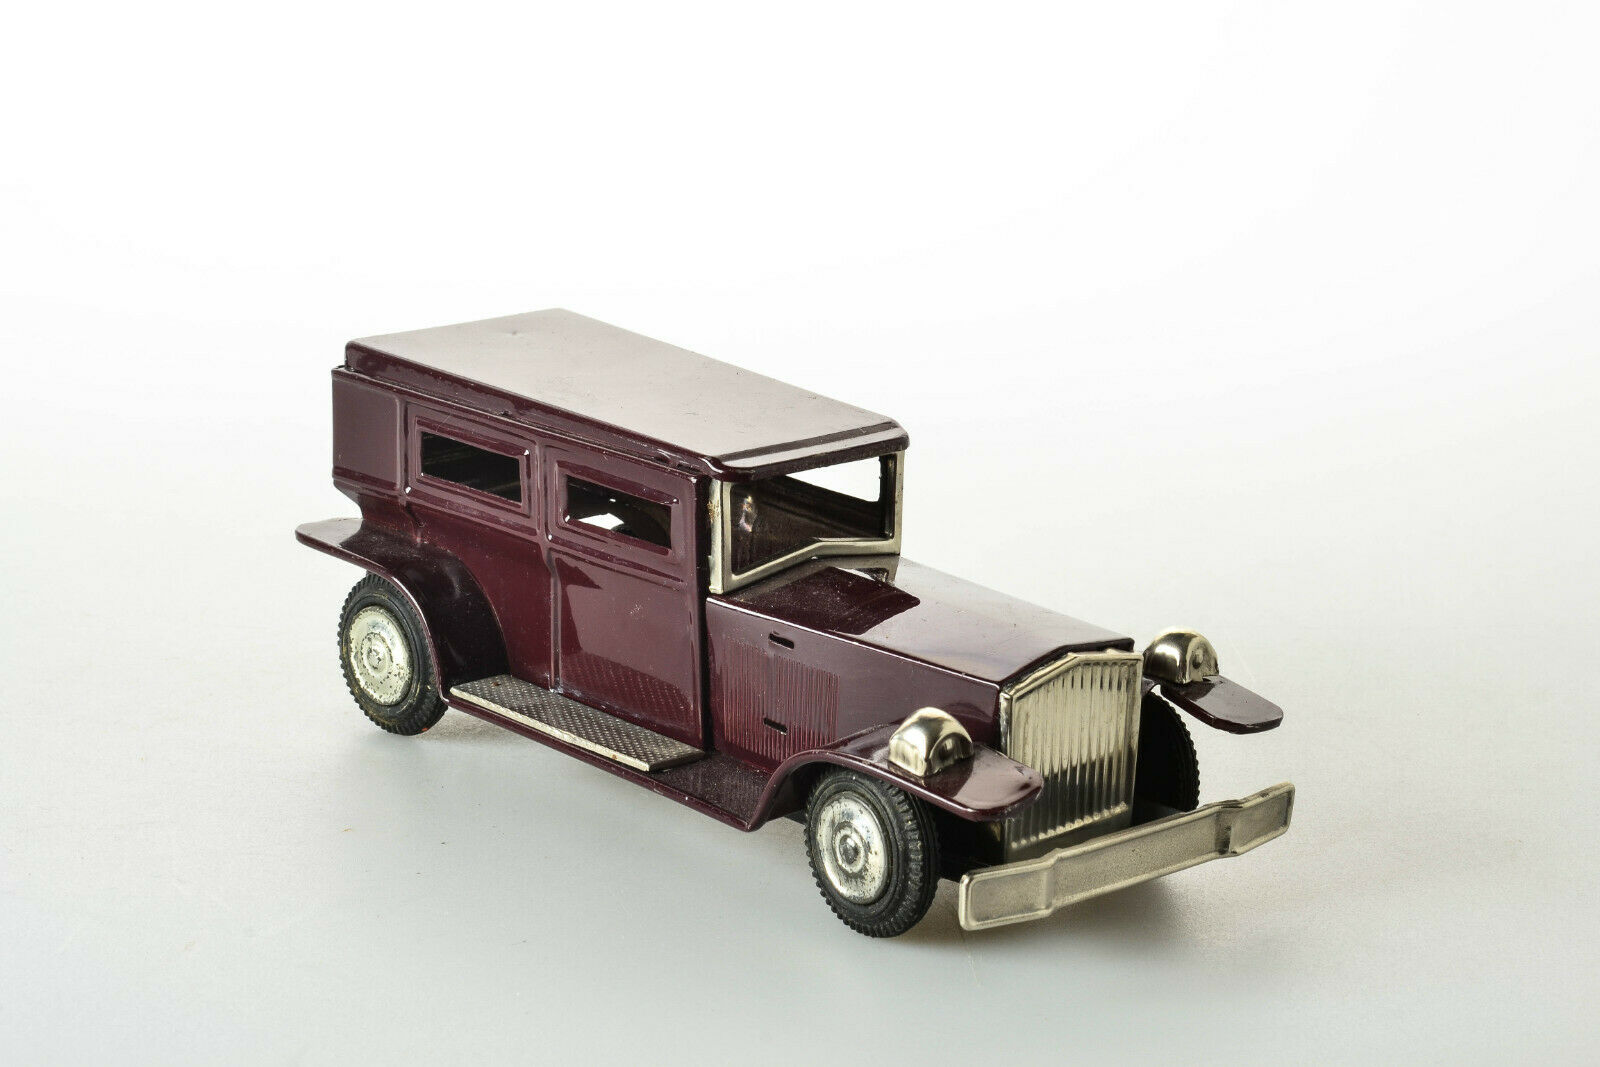 _AntiqueTin leksakaSälls 1920 Cadillac Al Capone Limousine bil japan